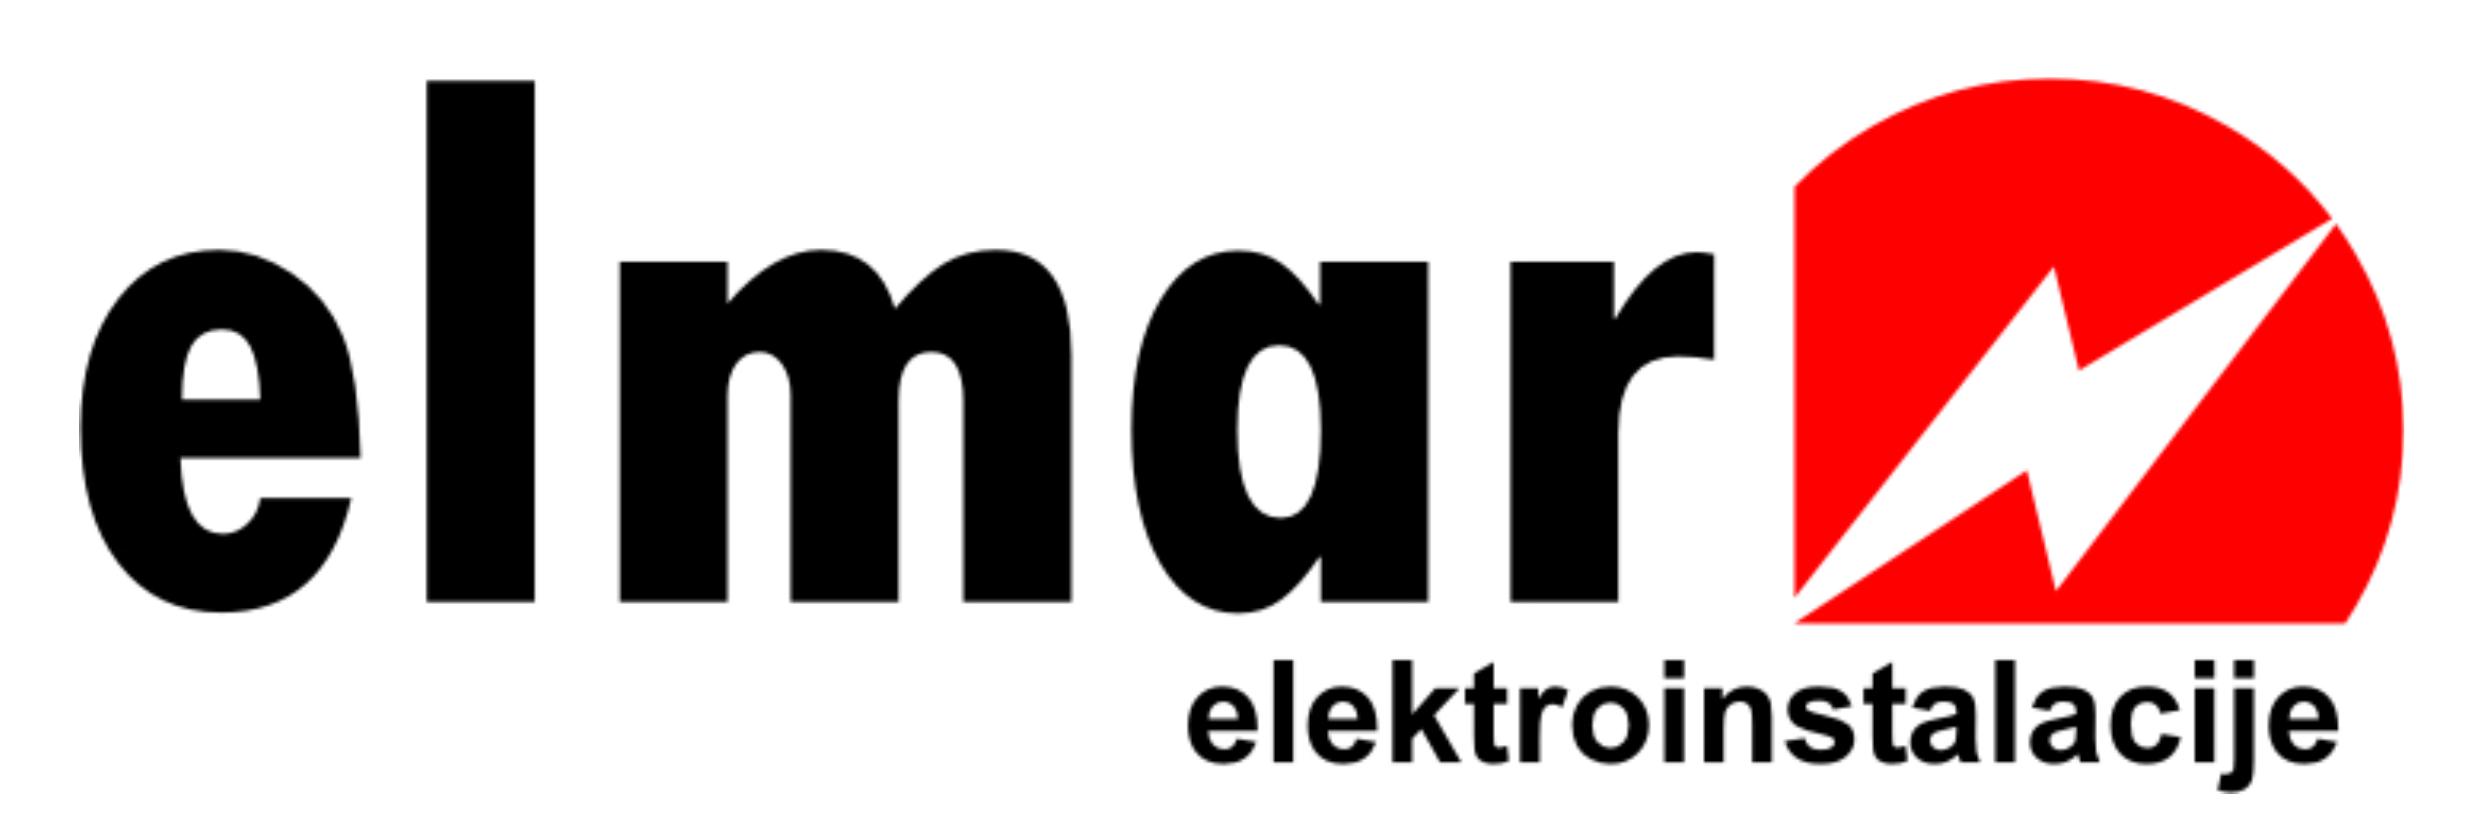 ELMAR ELEKTROINSTALACIJE